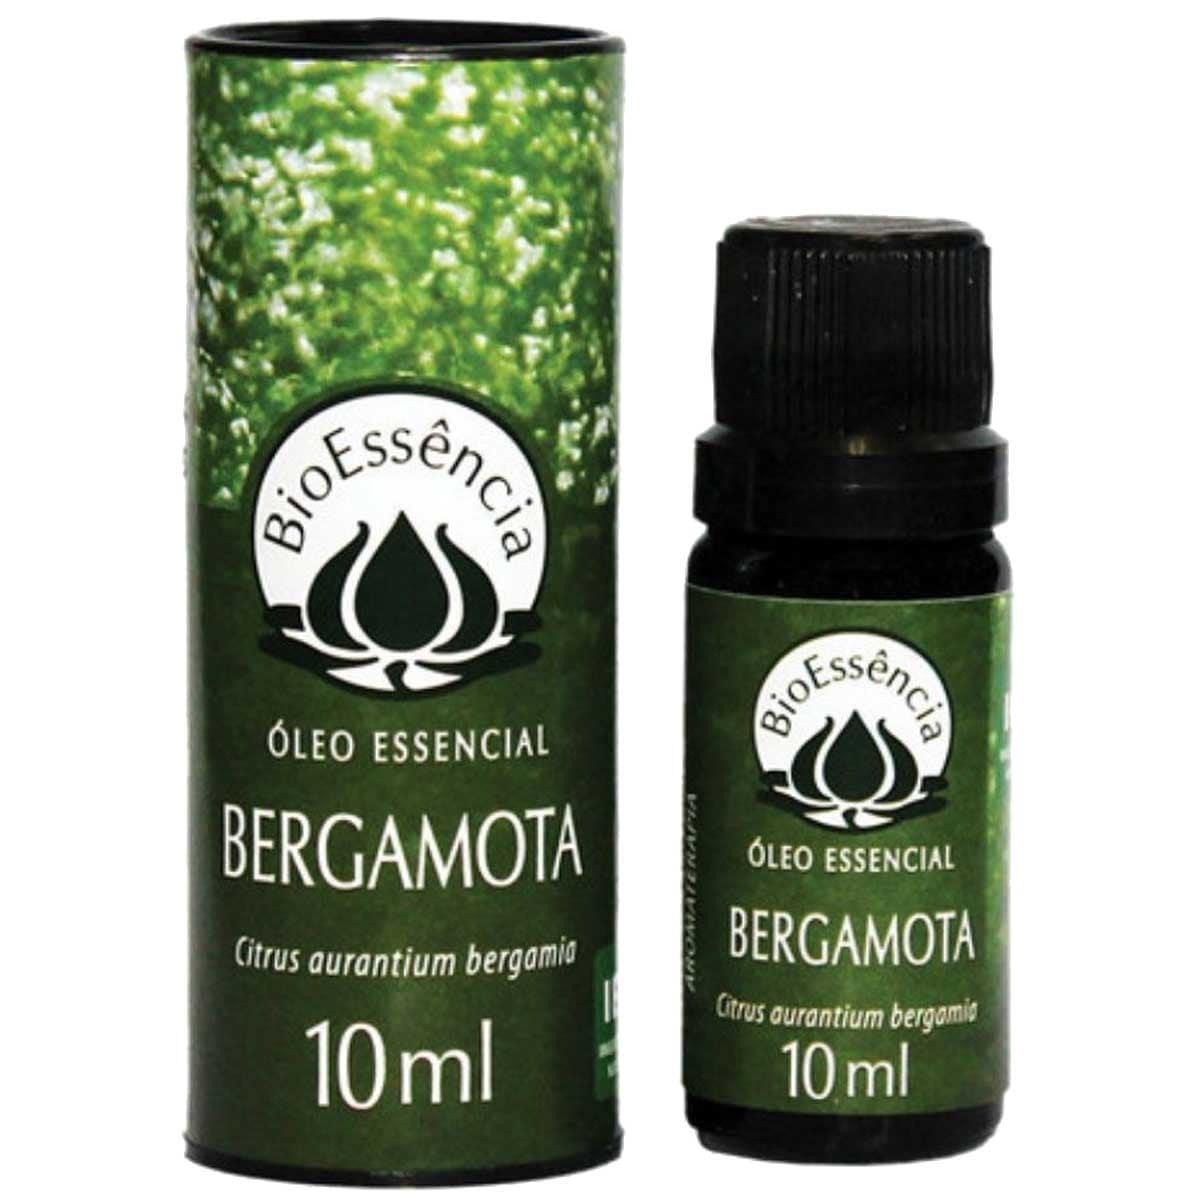 Óleo essencial bergamota - Bioessência